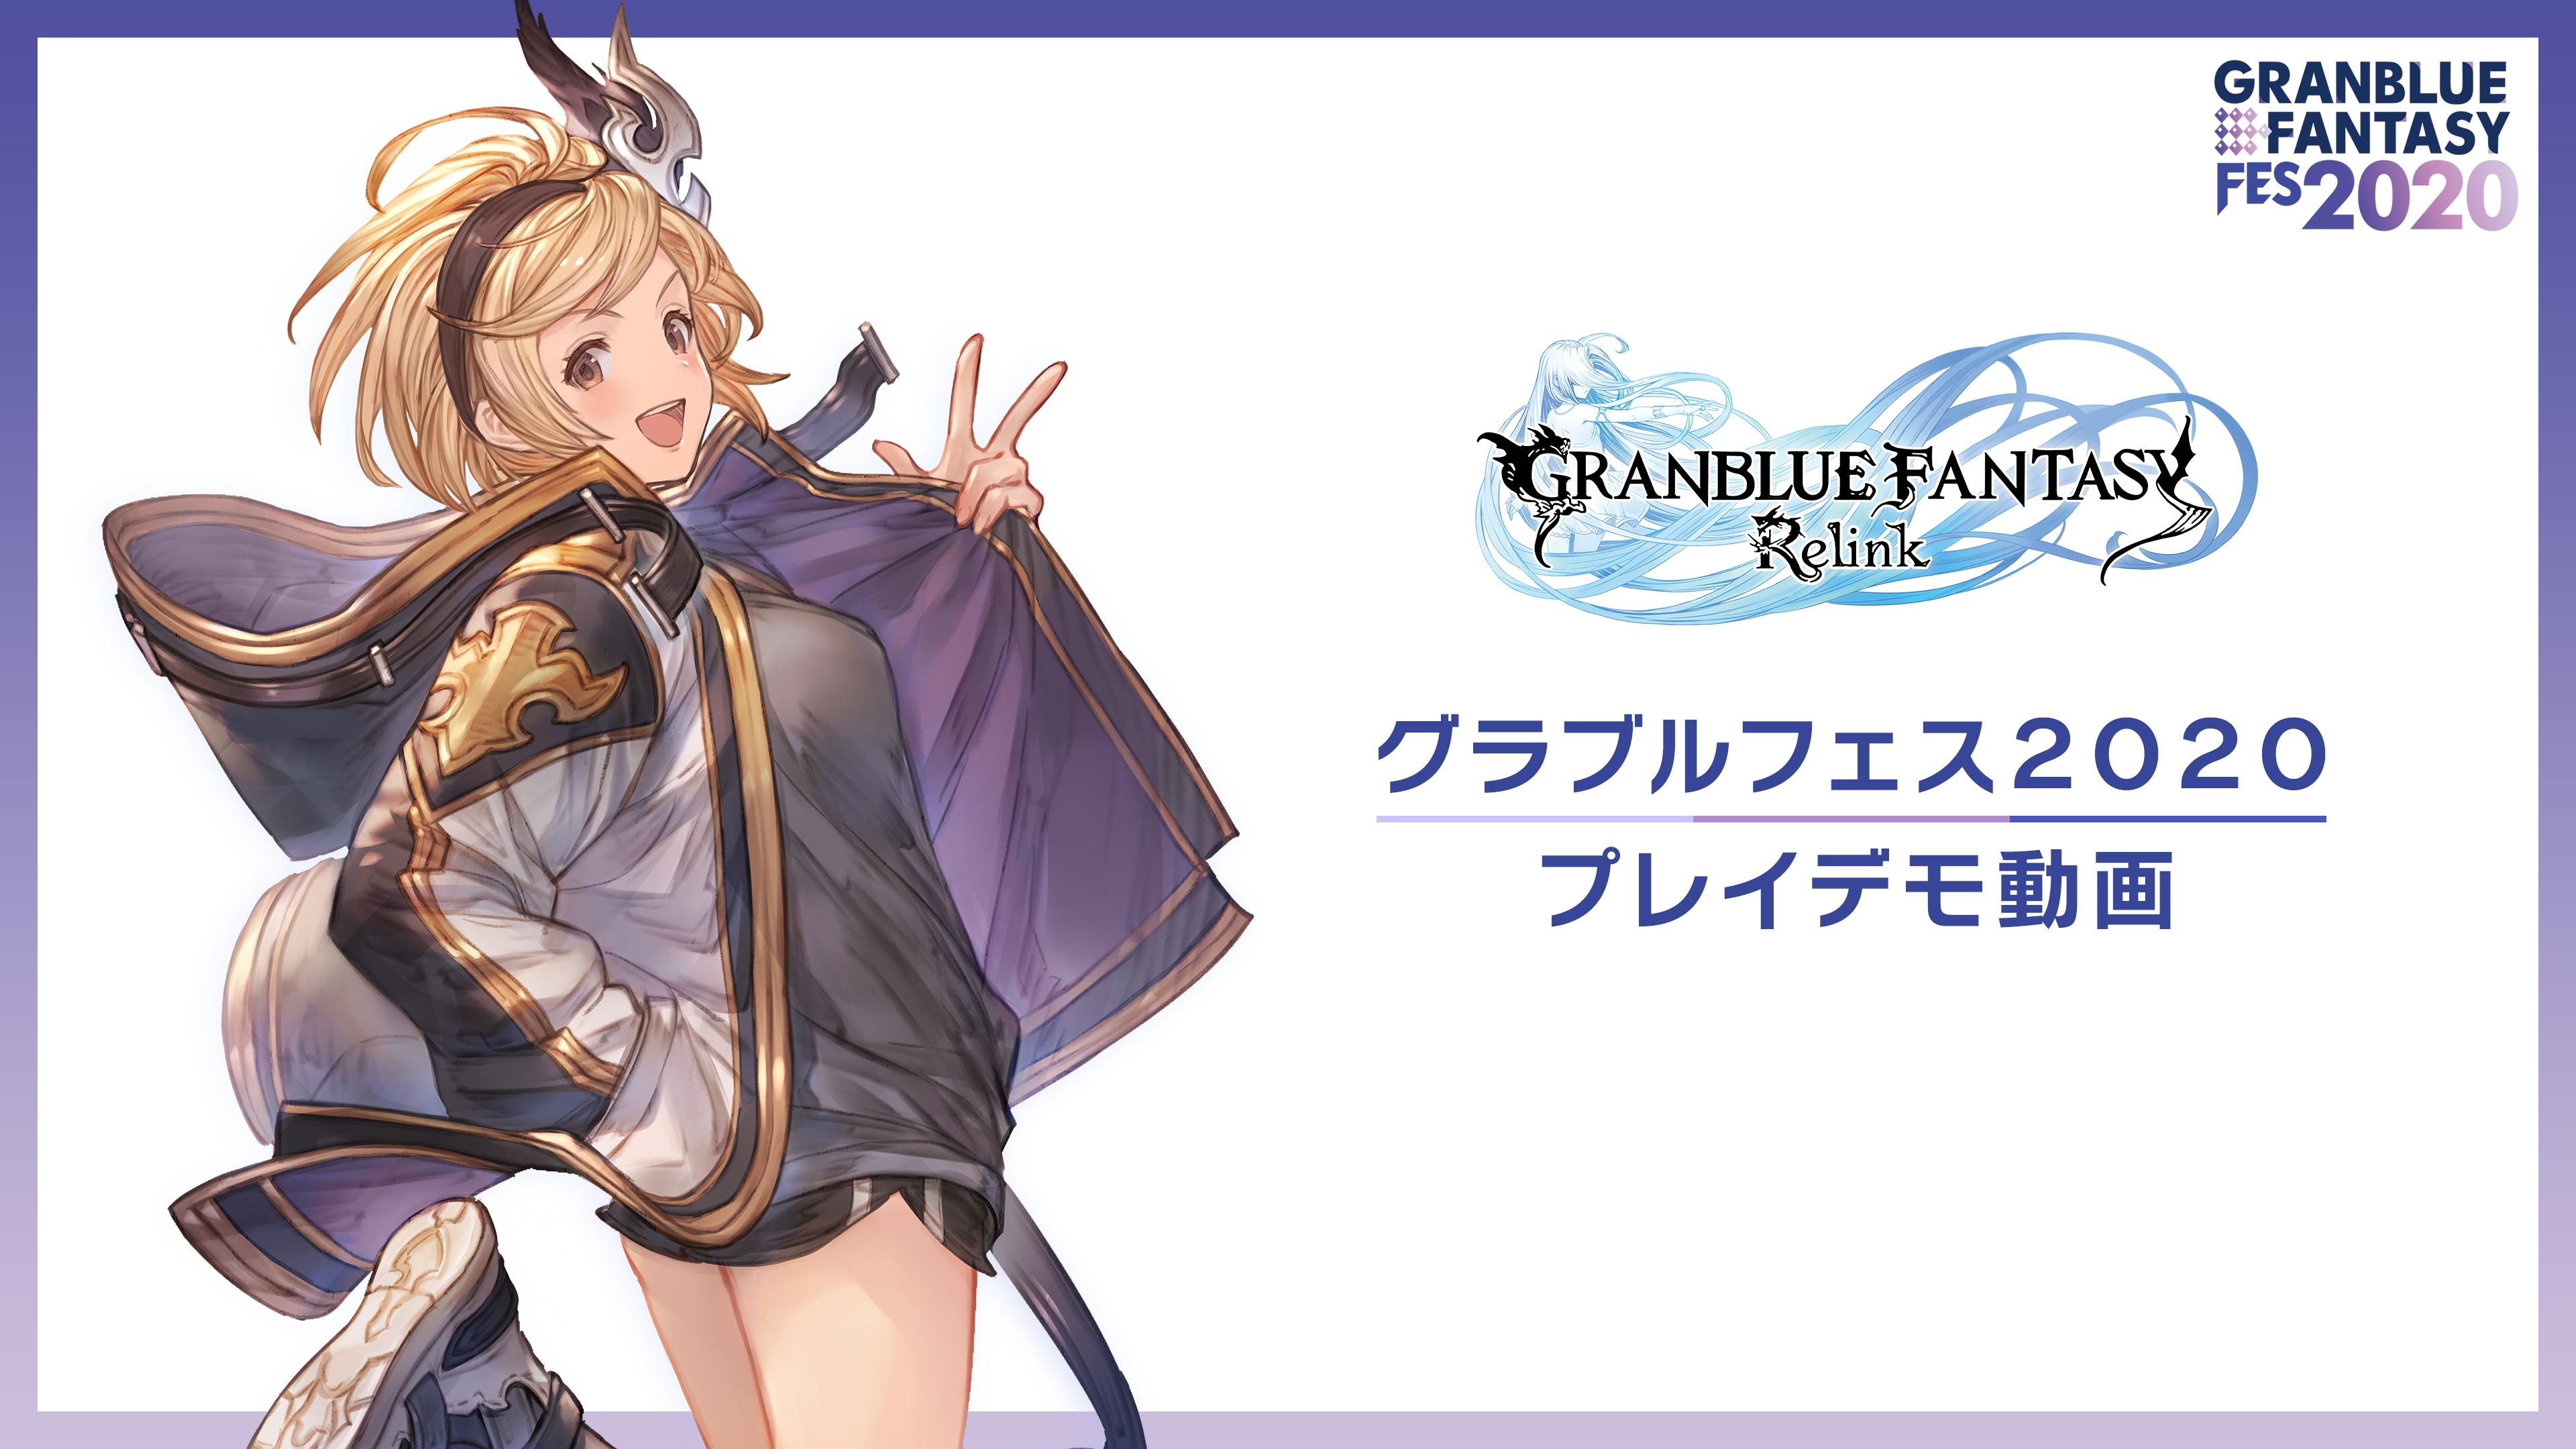 Granblue-Fantasy-Relink_2020_12-18-20_001